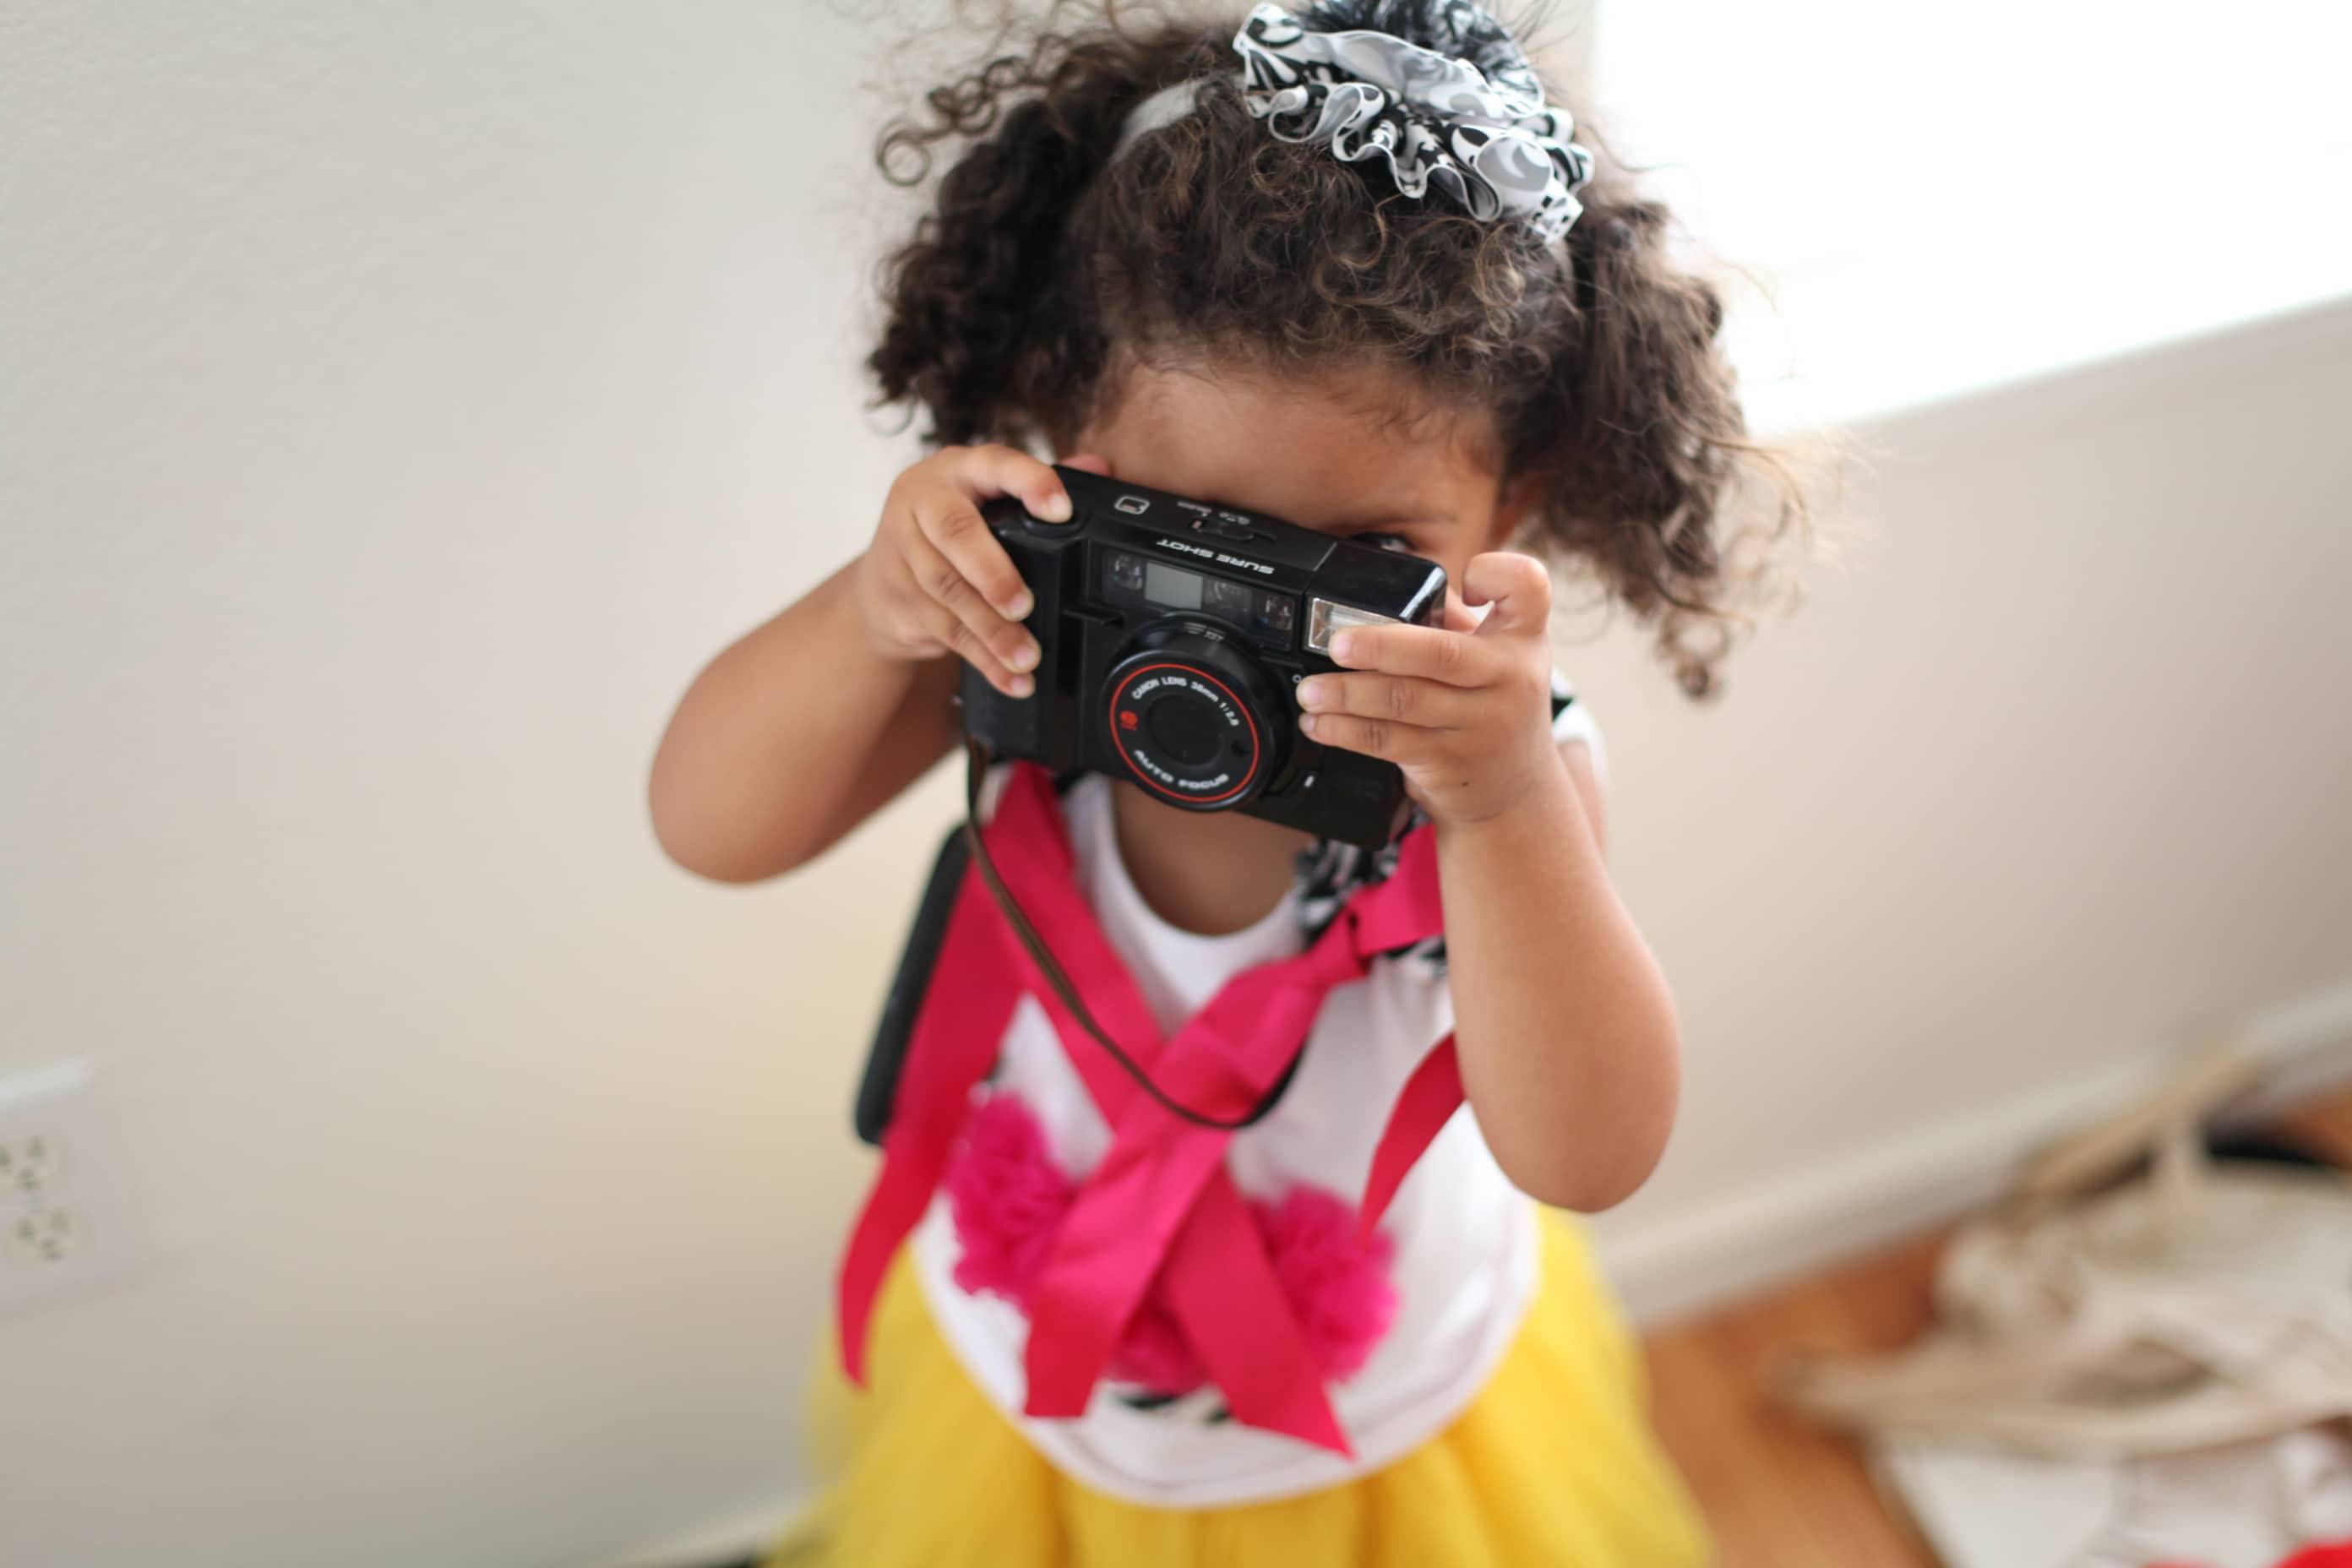 Child Photographer Child photographer